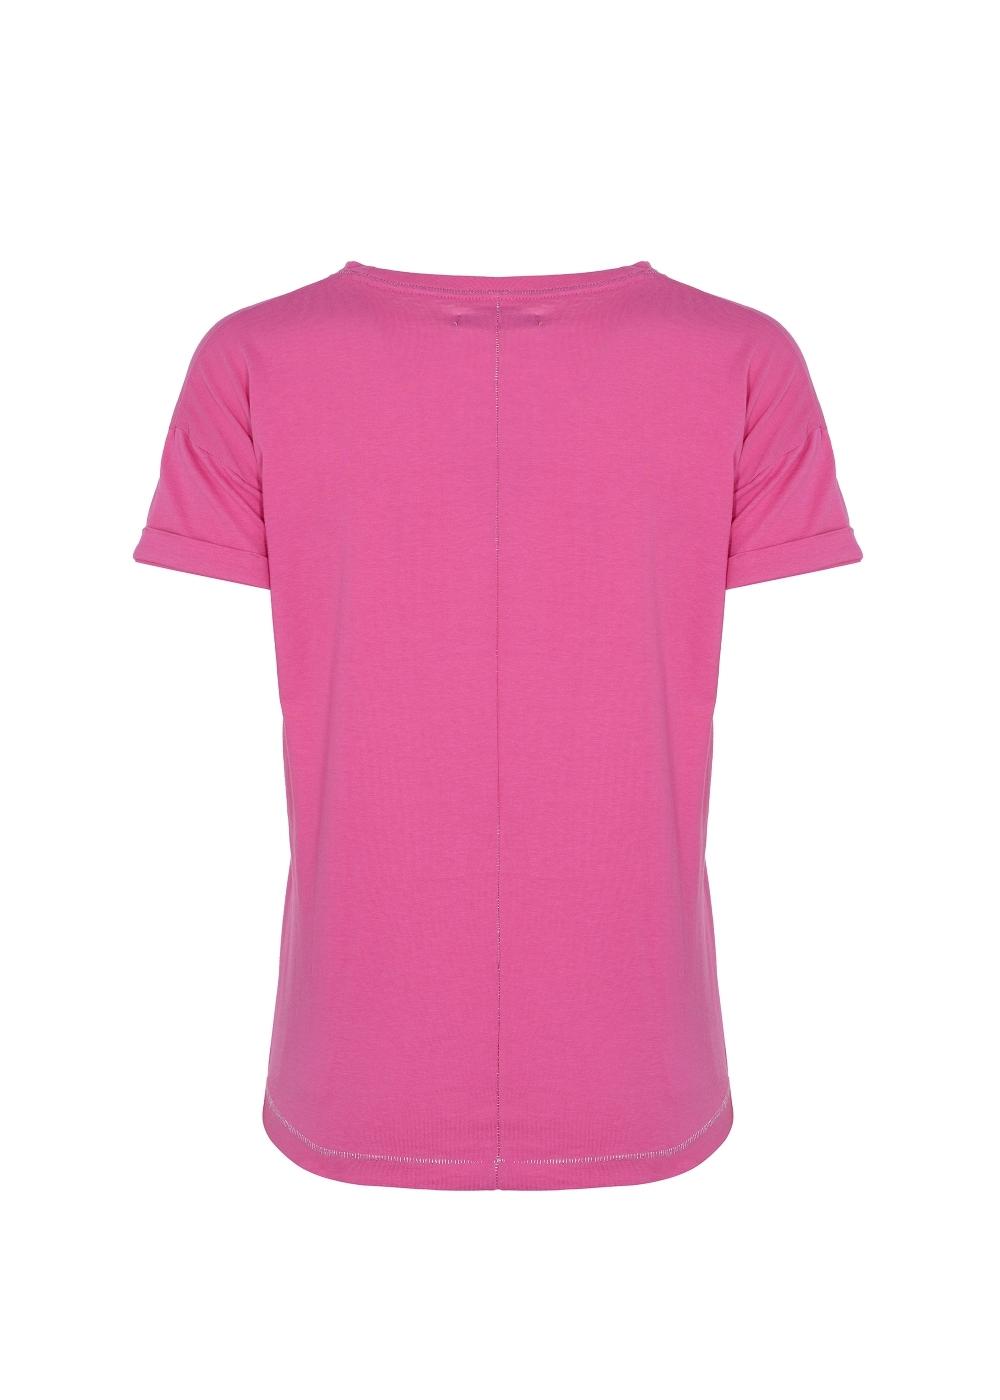 T-shirt damski TSHDT-0026-65(W19)